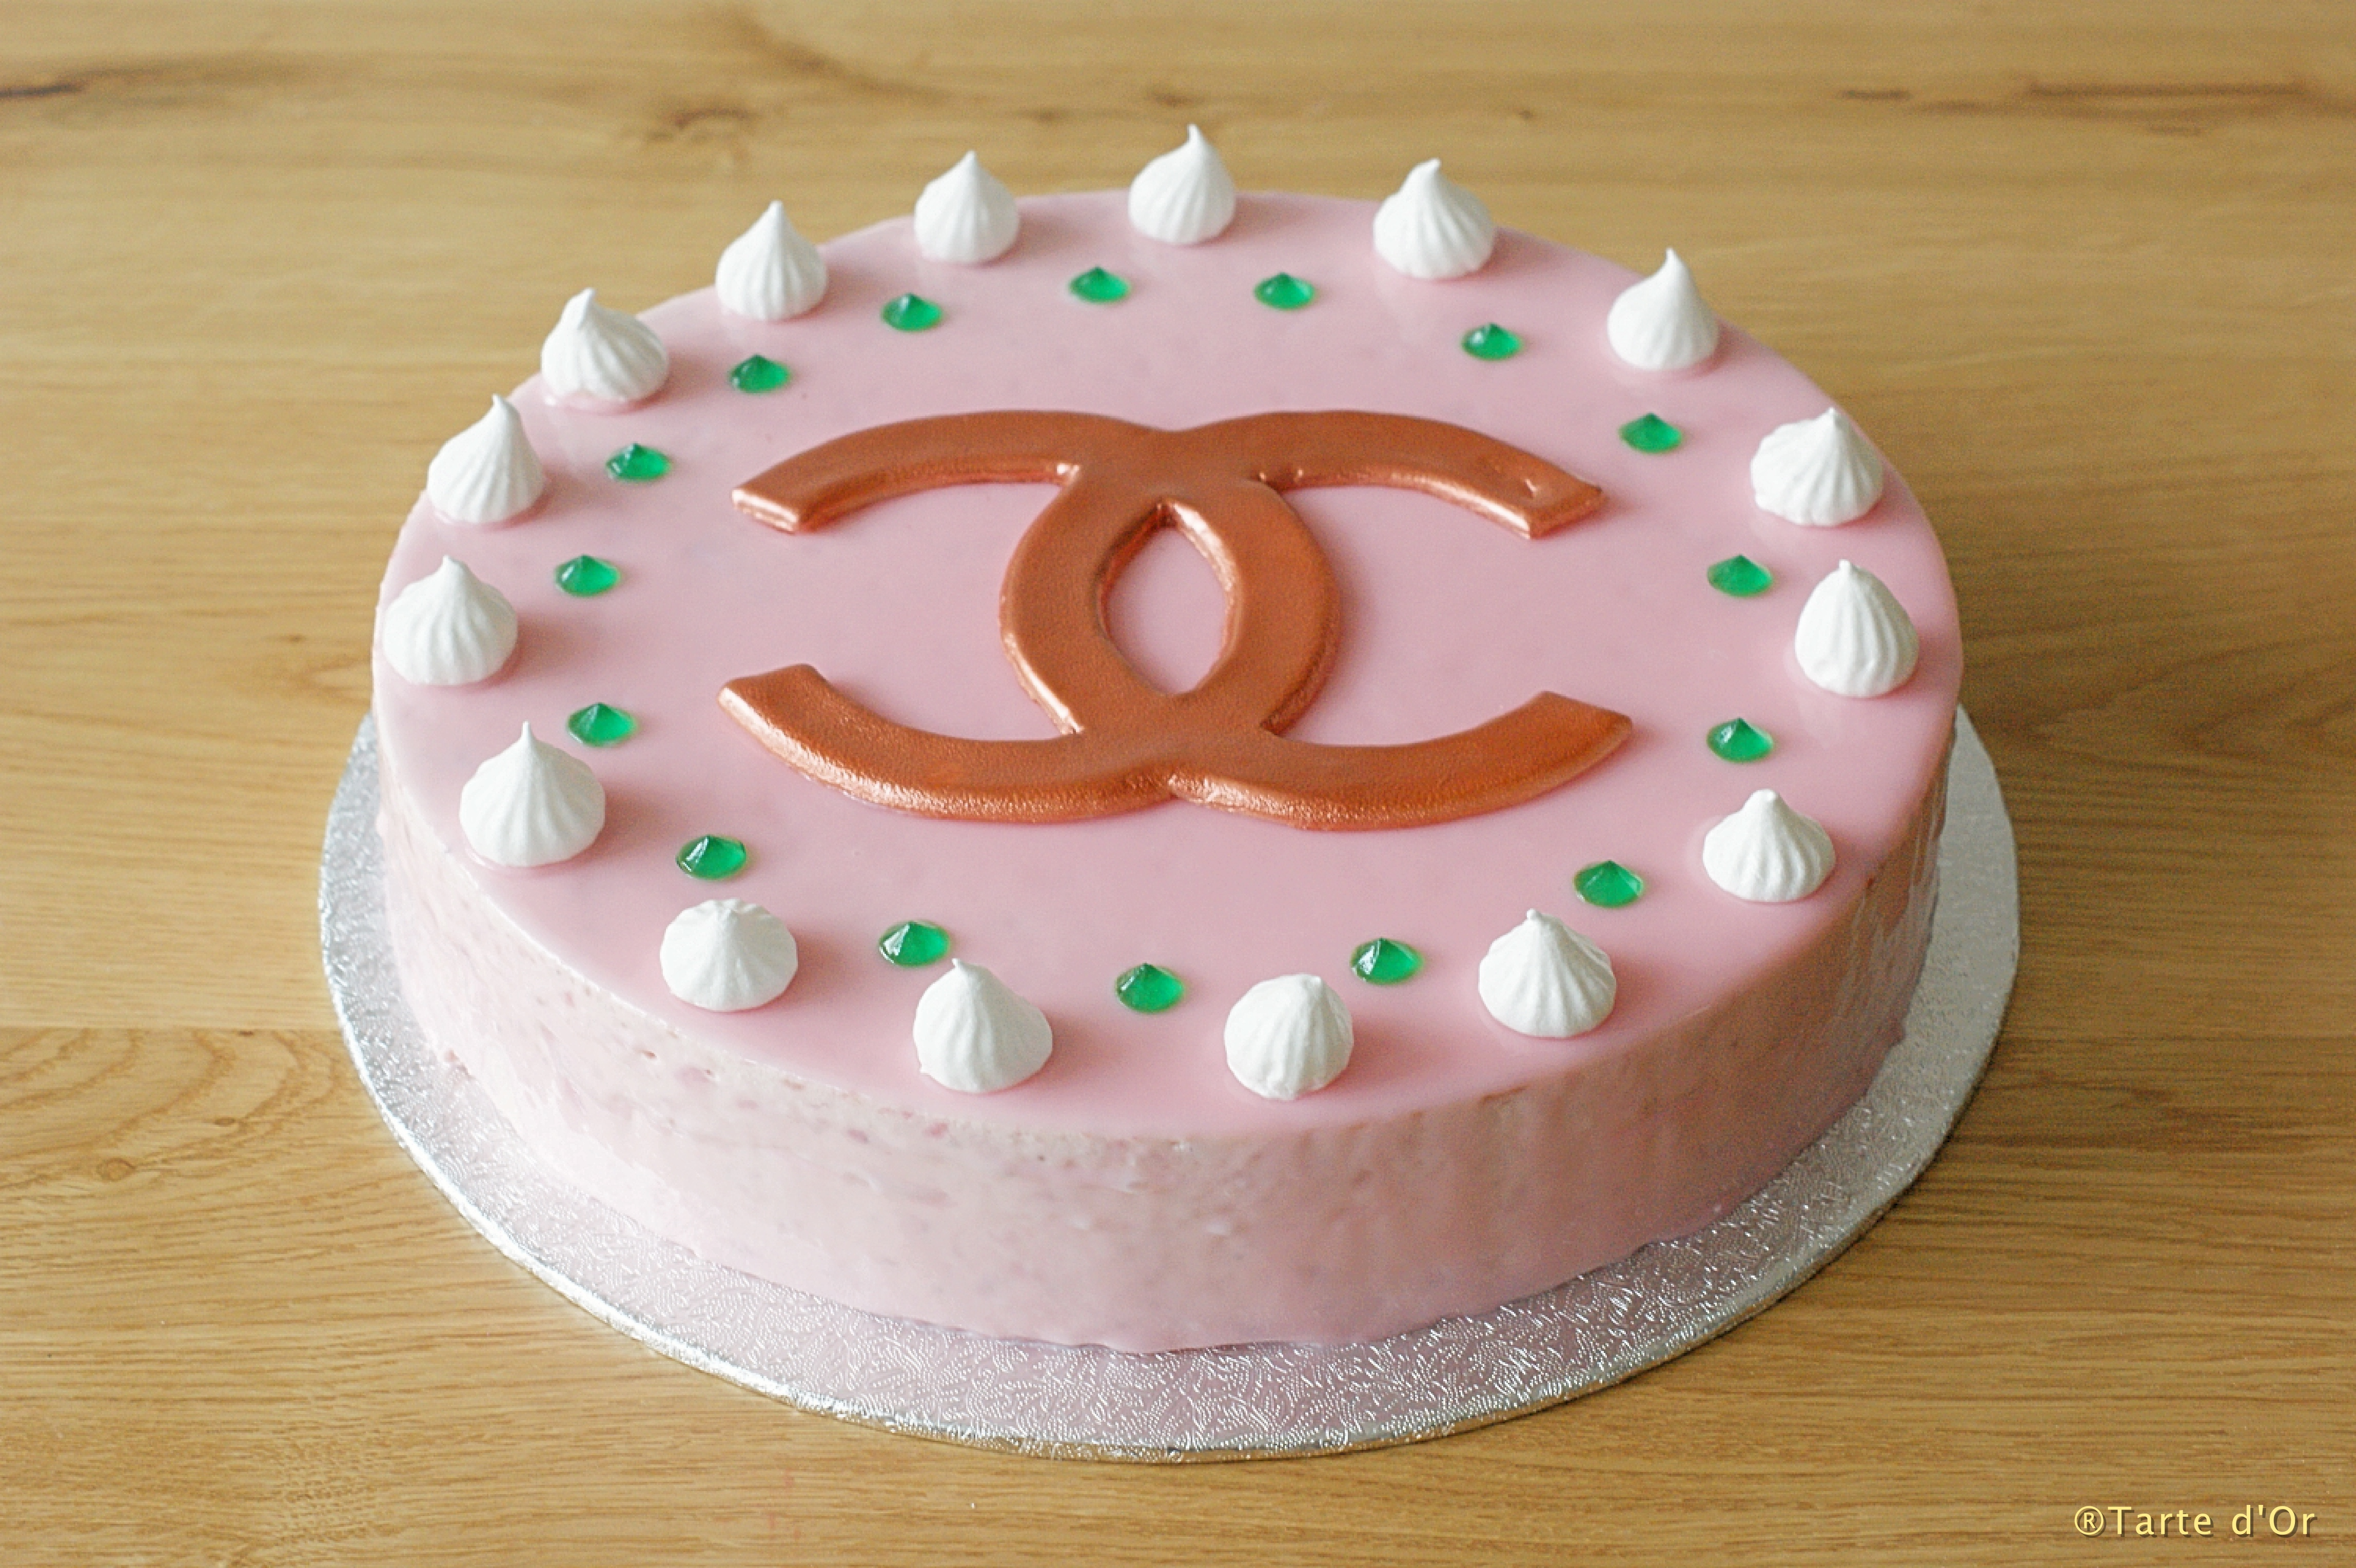 Strawberry Meringue Mousse Cake